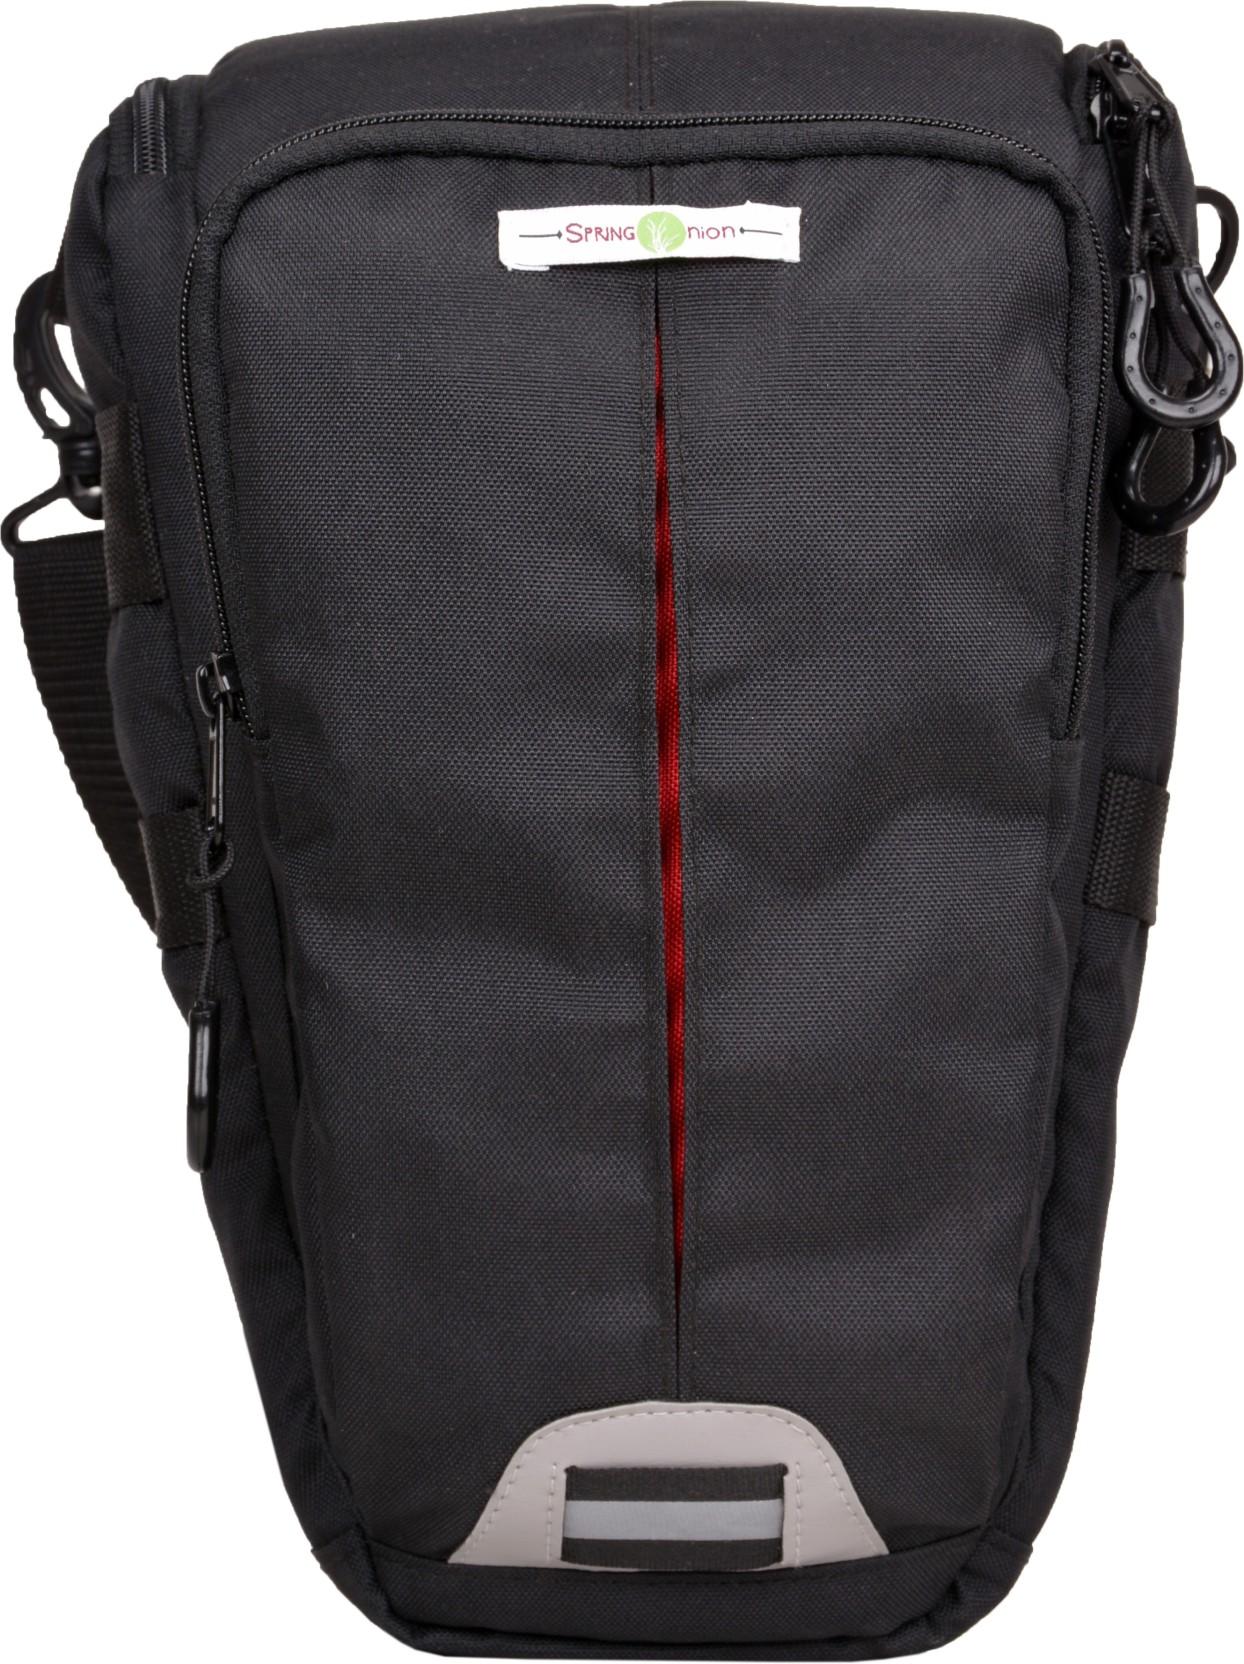 Springonion Flash Camera Bag Lowepro Toploader Zoom 45 Aw Ii Black Home